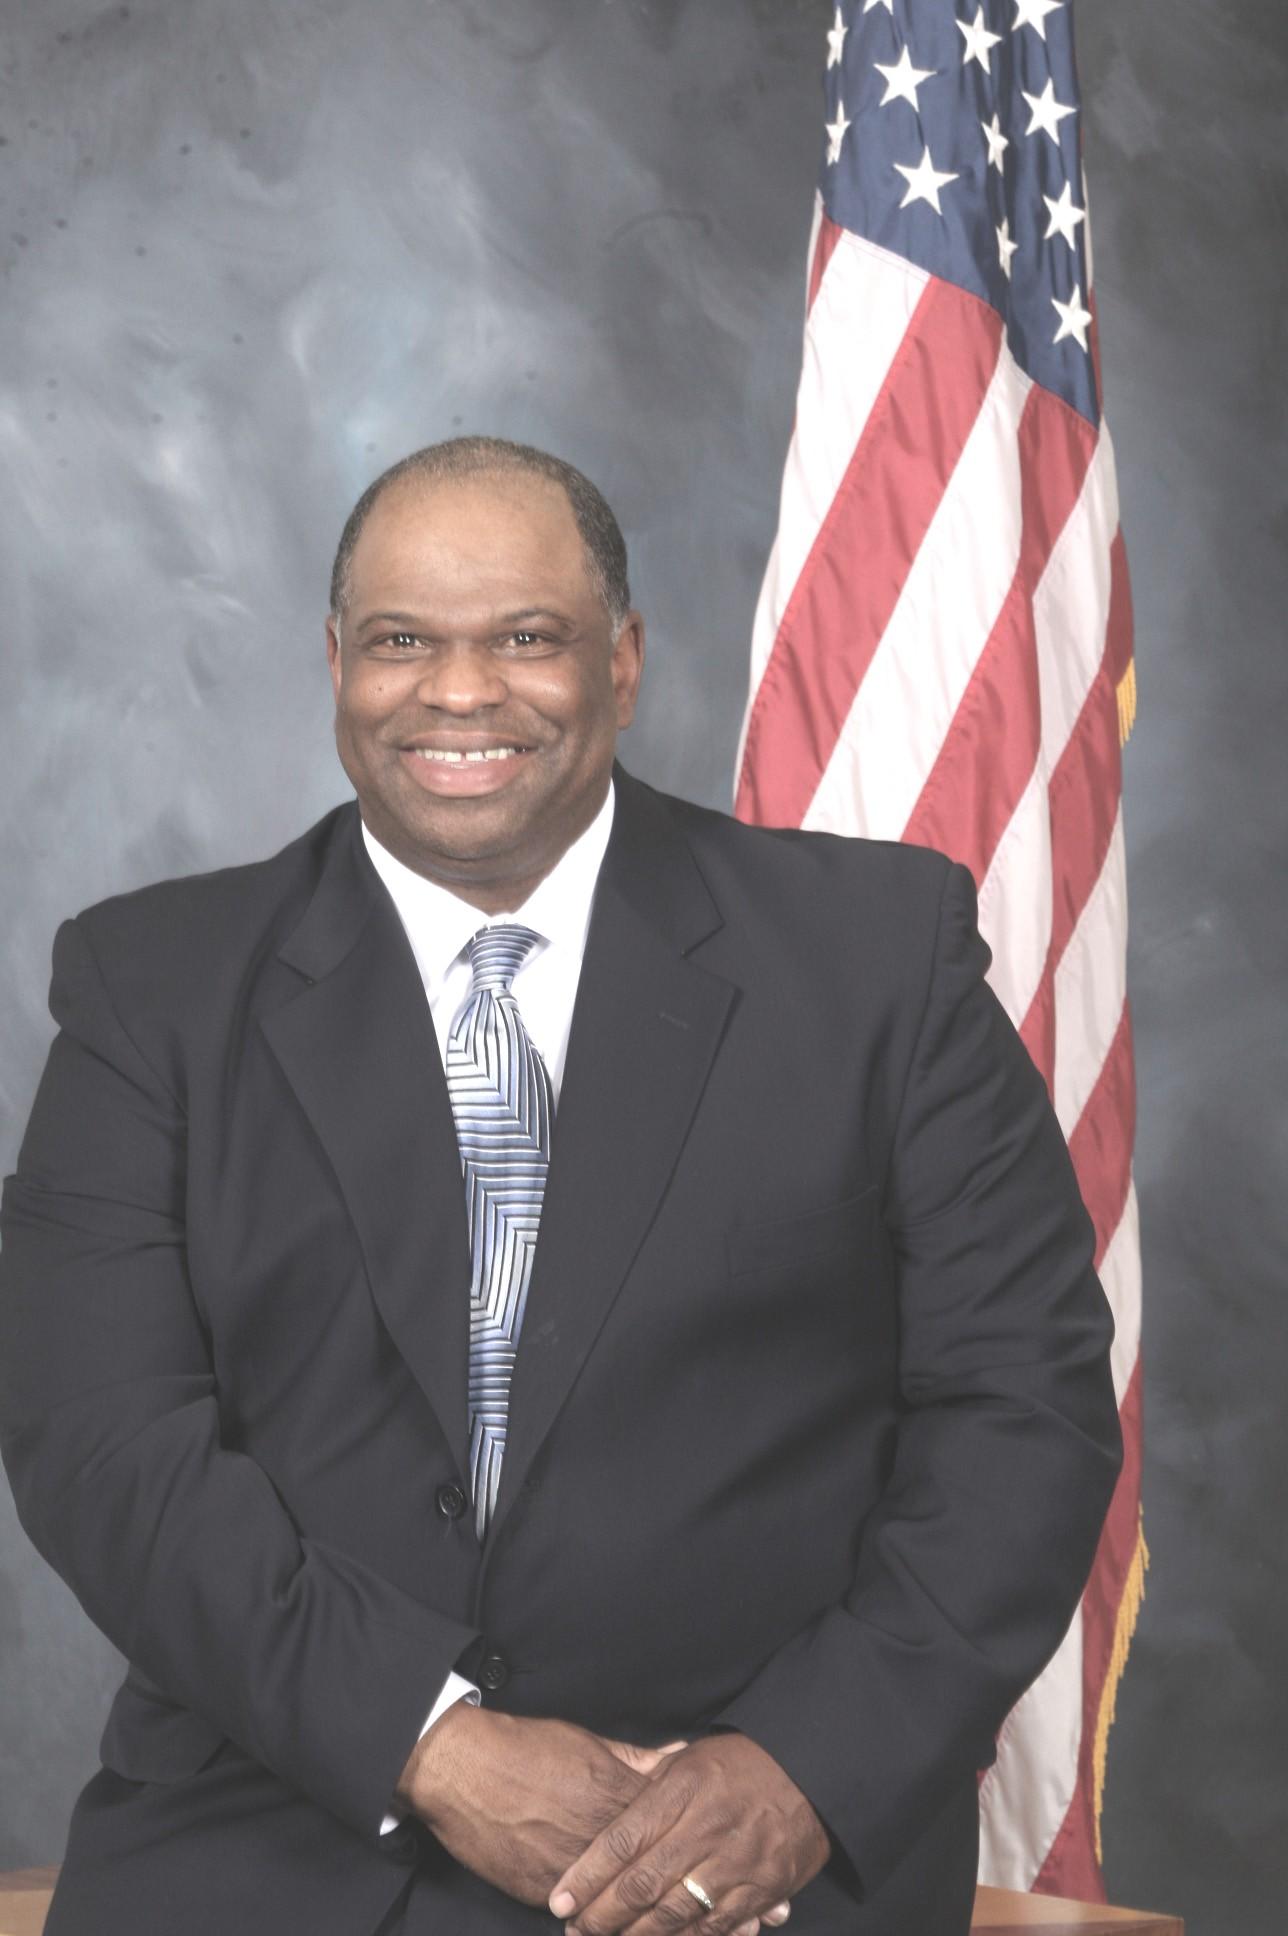 SHOCK: Black Democrat Freeholder Accuses Senator Whelan of Overt Racism